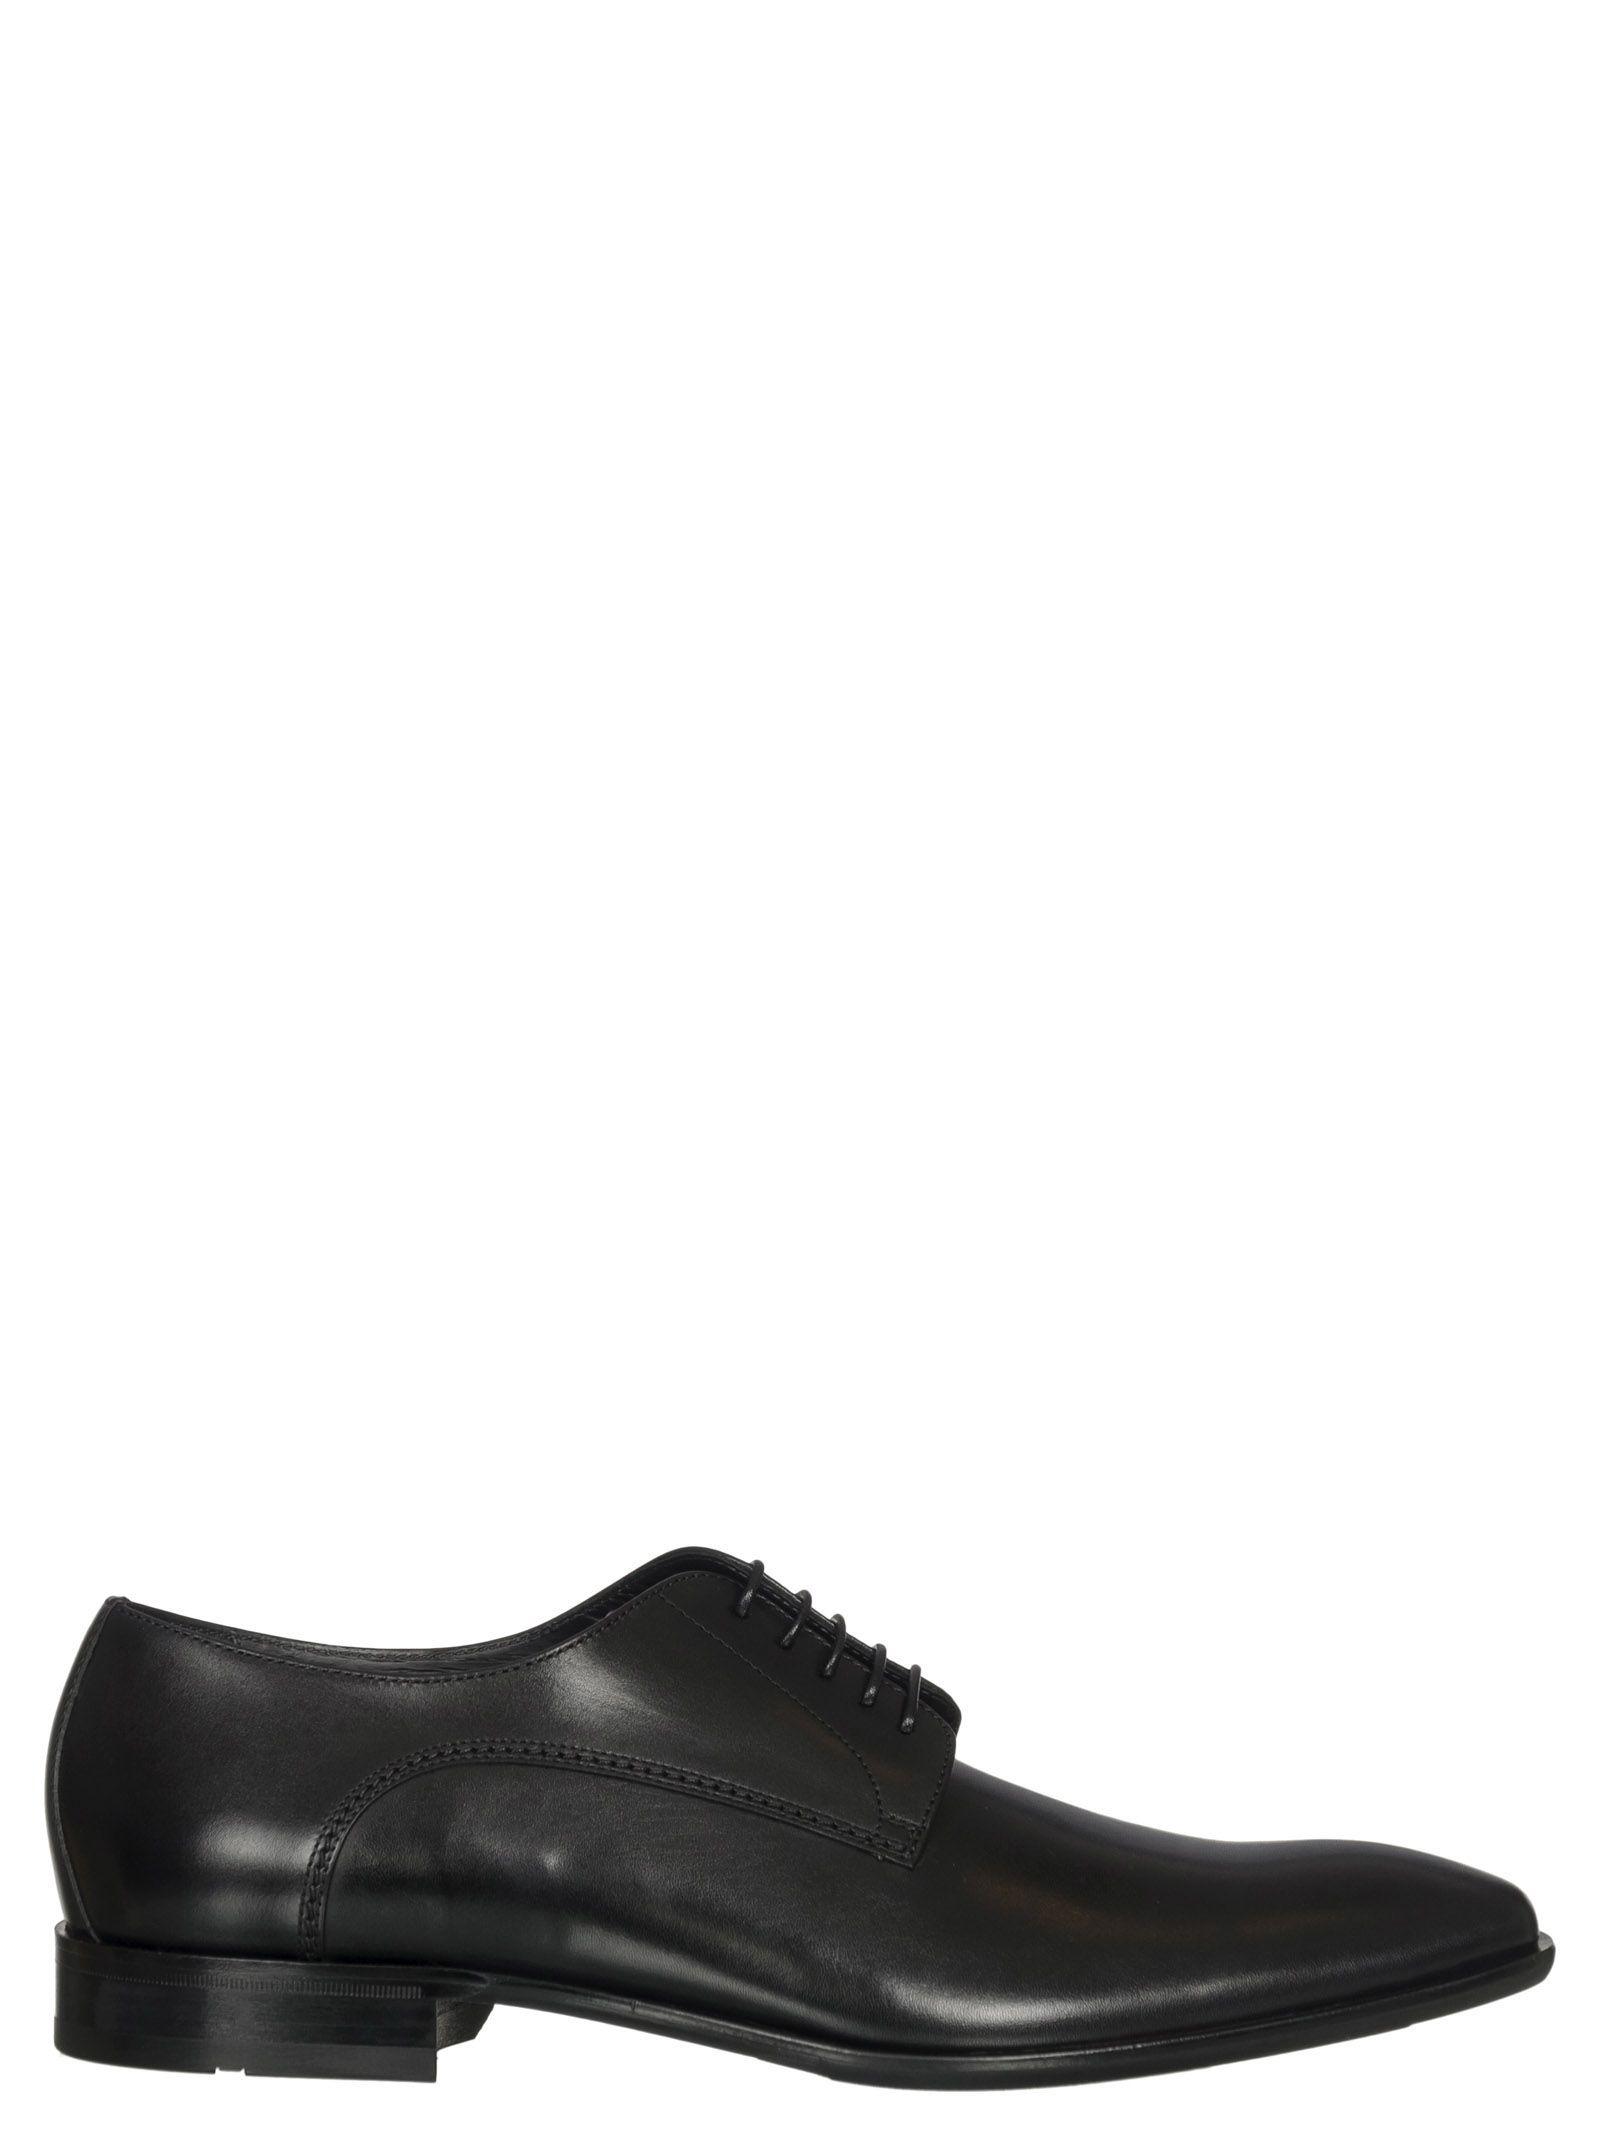 Carmons Chaussures Patron Hugo OhREoj